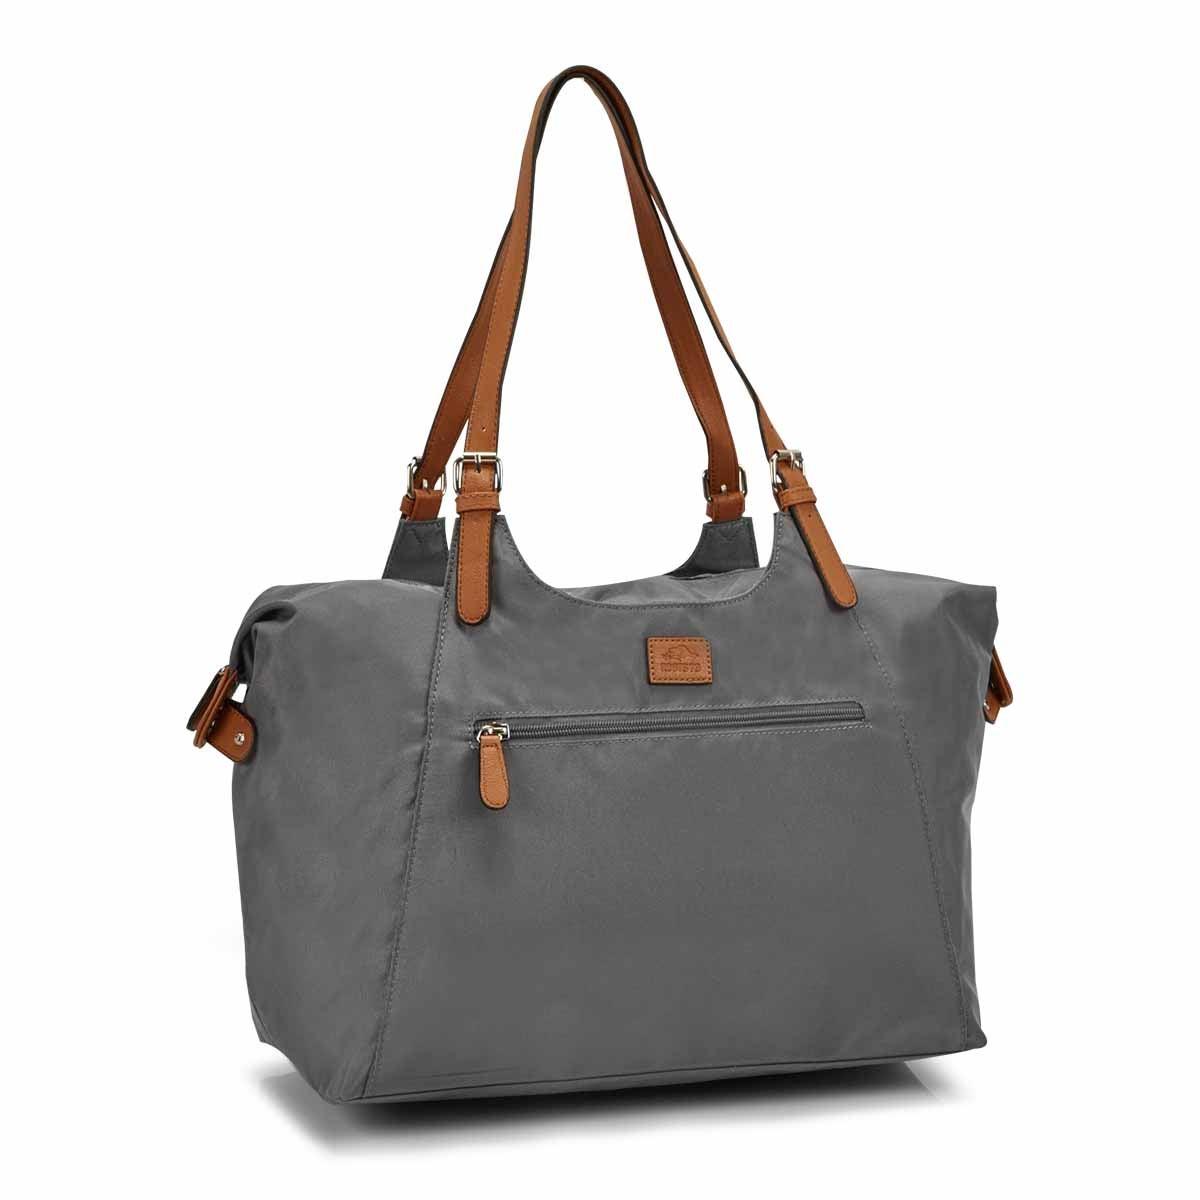 Women's R4700 grey large tote bag